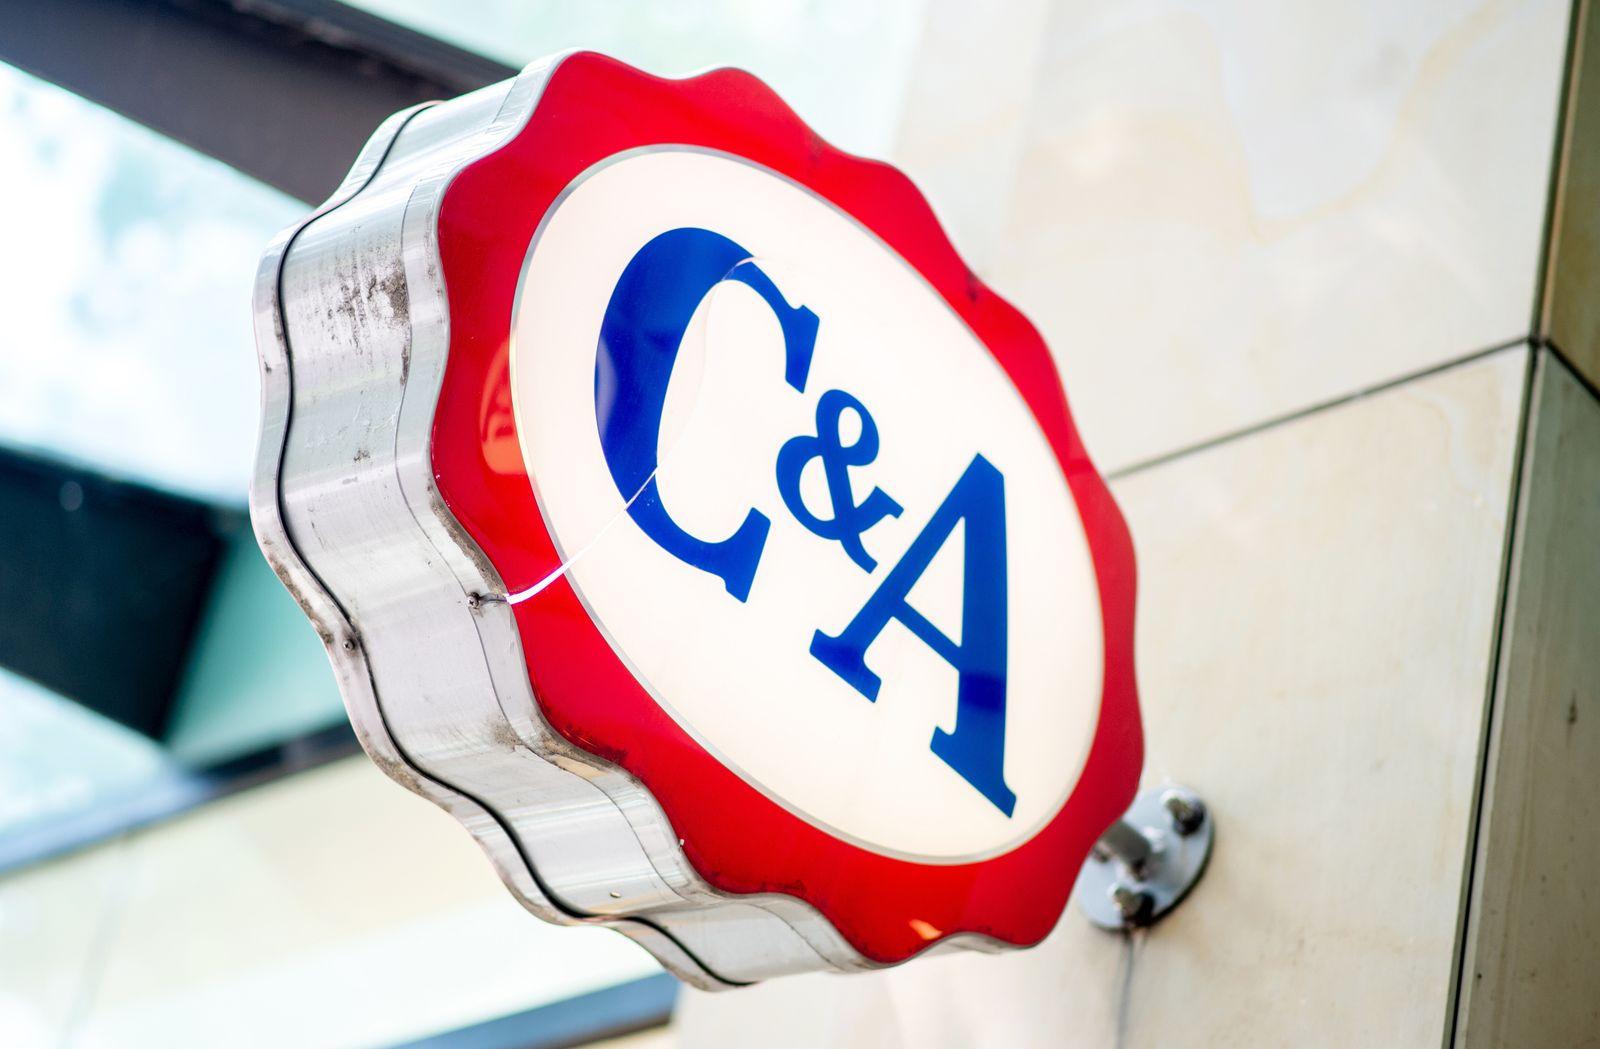 Filiale von C&A in Hannover